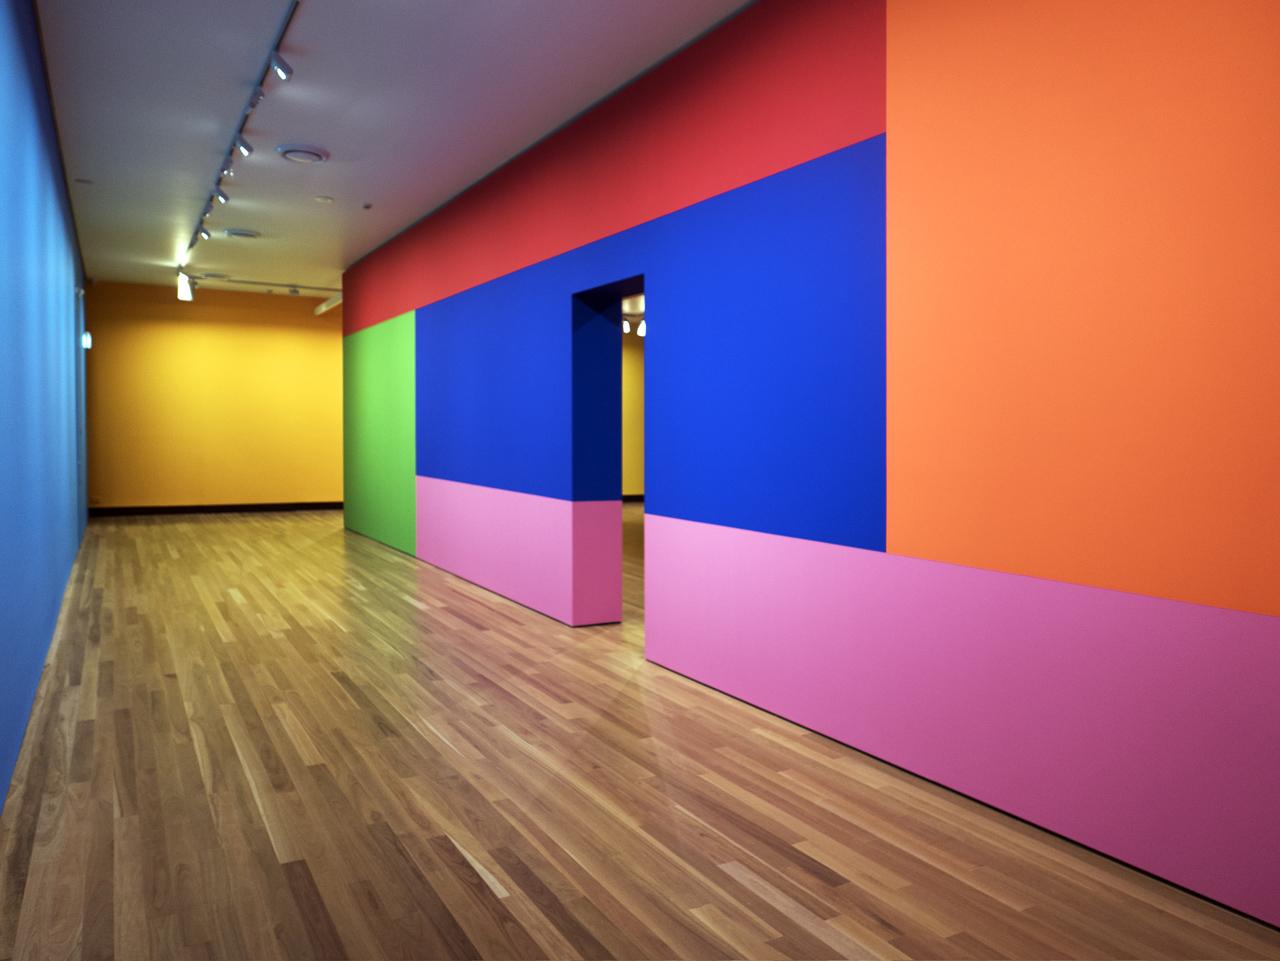 Robert Owen Afterglow Latrobe Reginal Gallery Install 2_LR.jpg